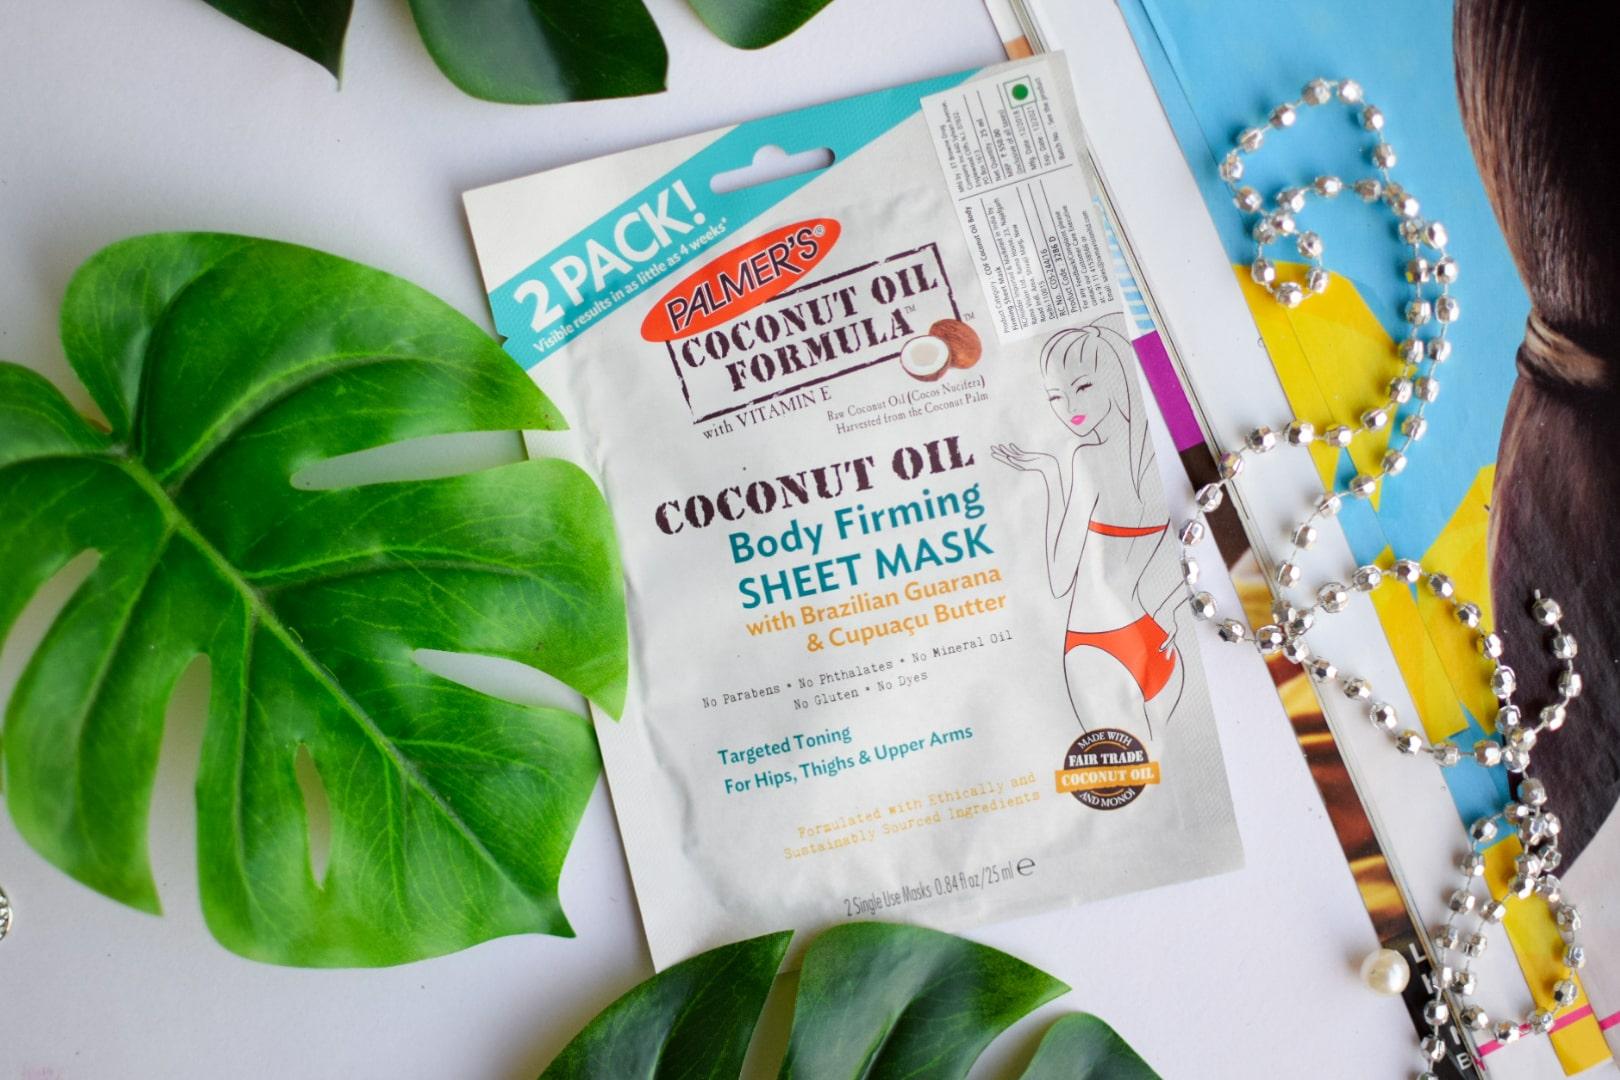 Palmer's Coconut Oil Formula Body Firm Sheet Mask